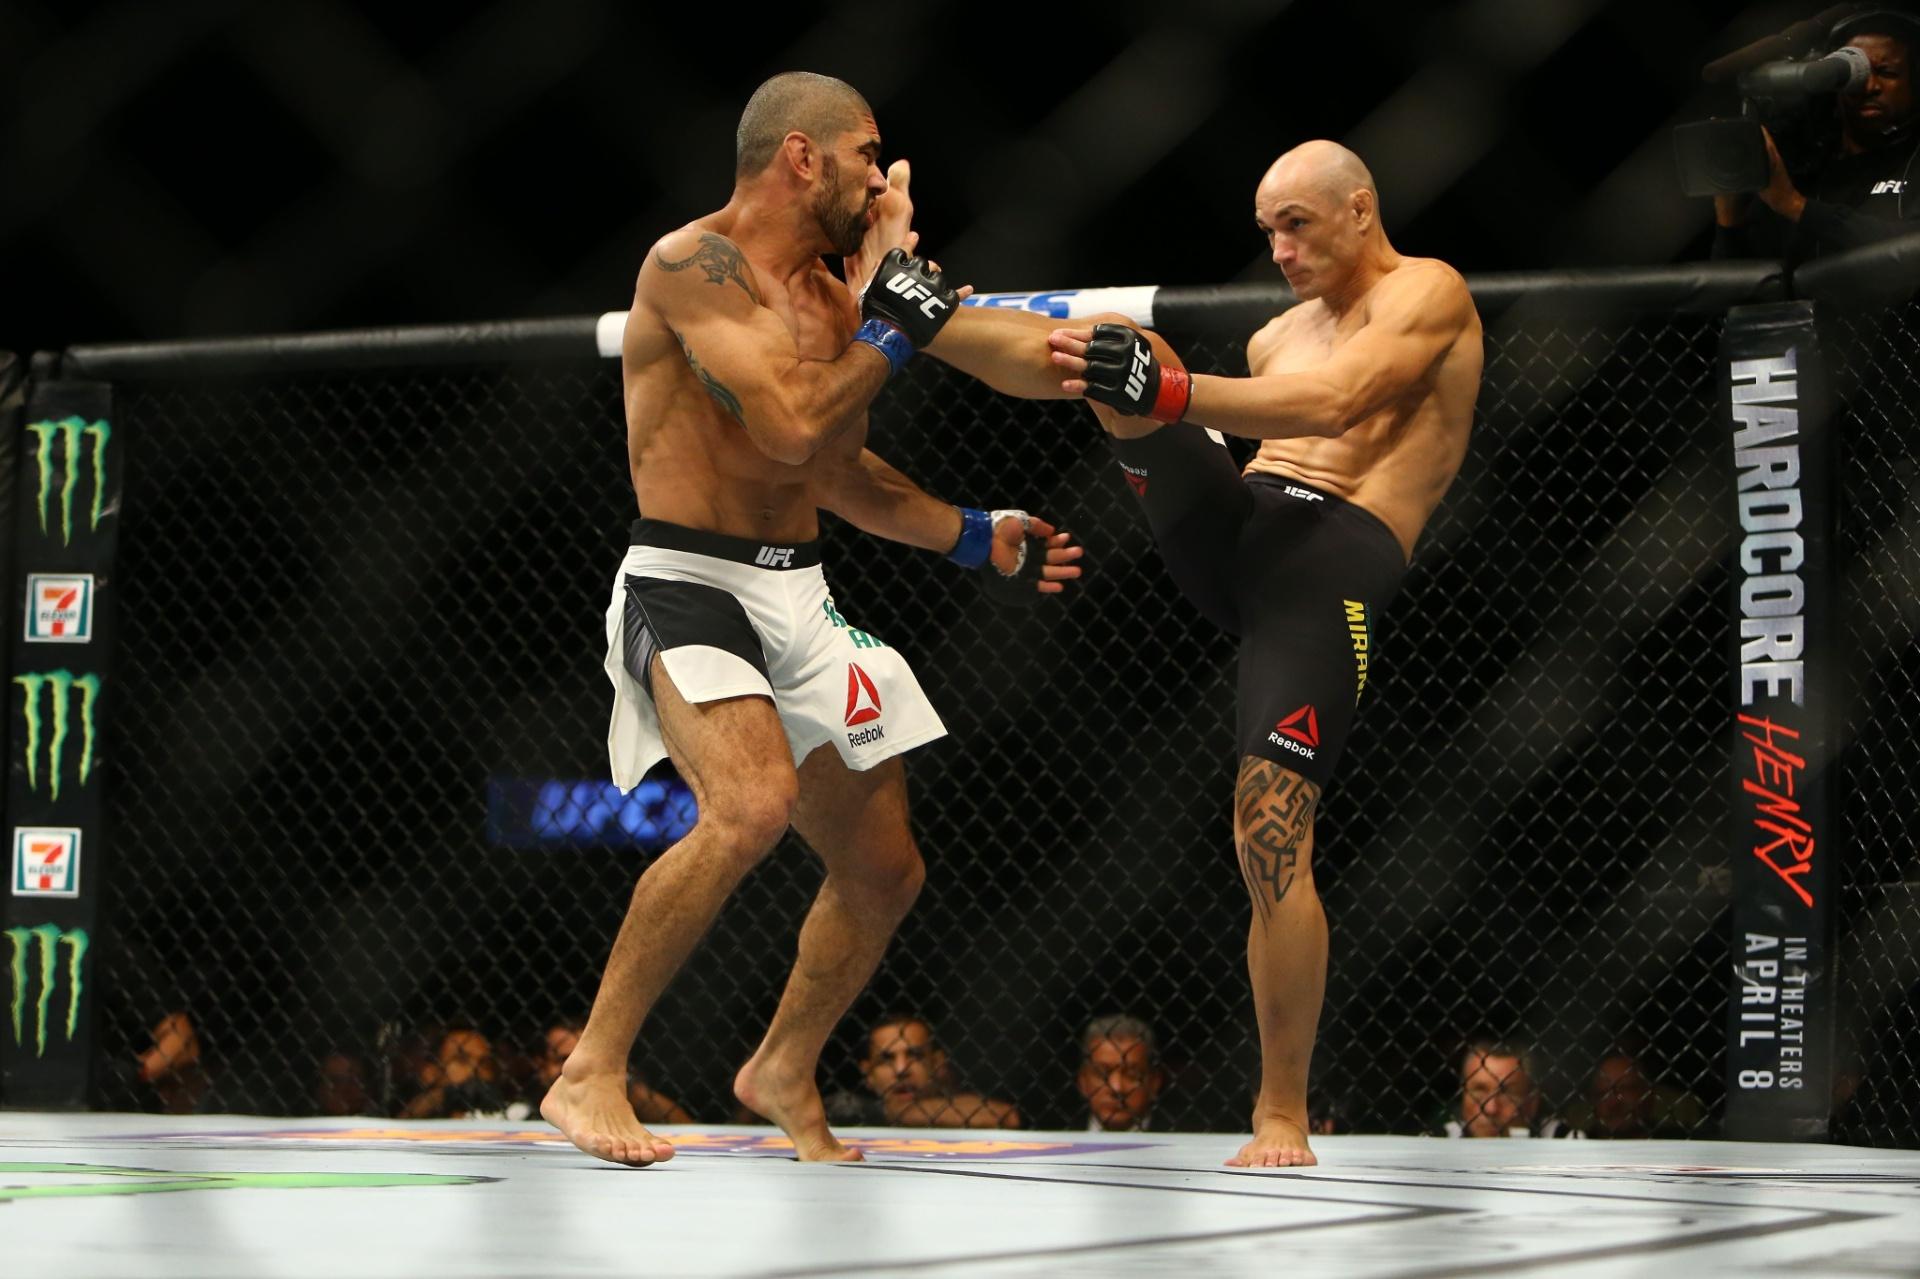 Vitor Miranda acerta chute no rosto de Marcelo Guimarães durante o UFC 196